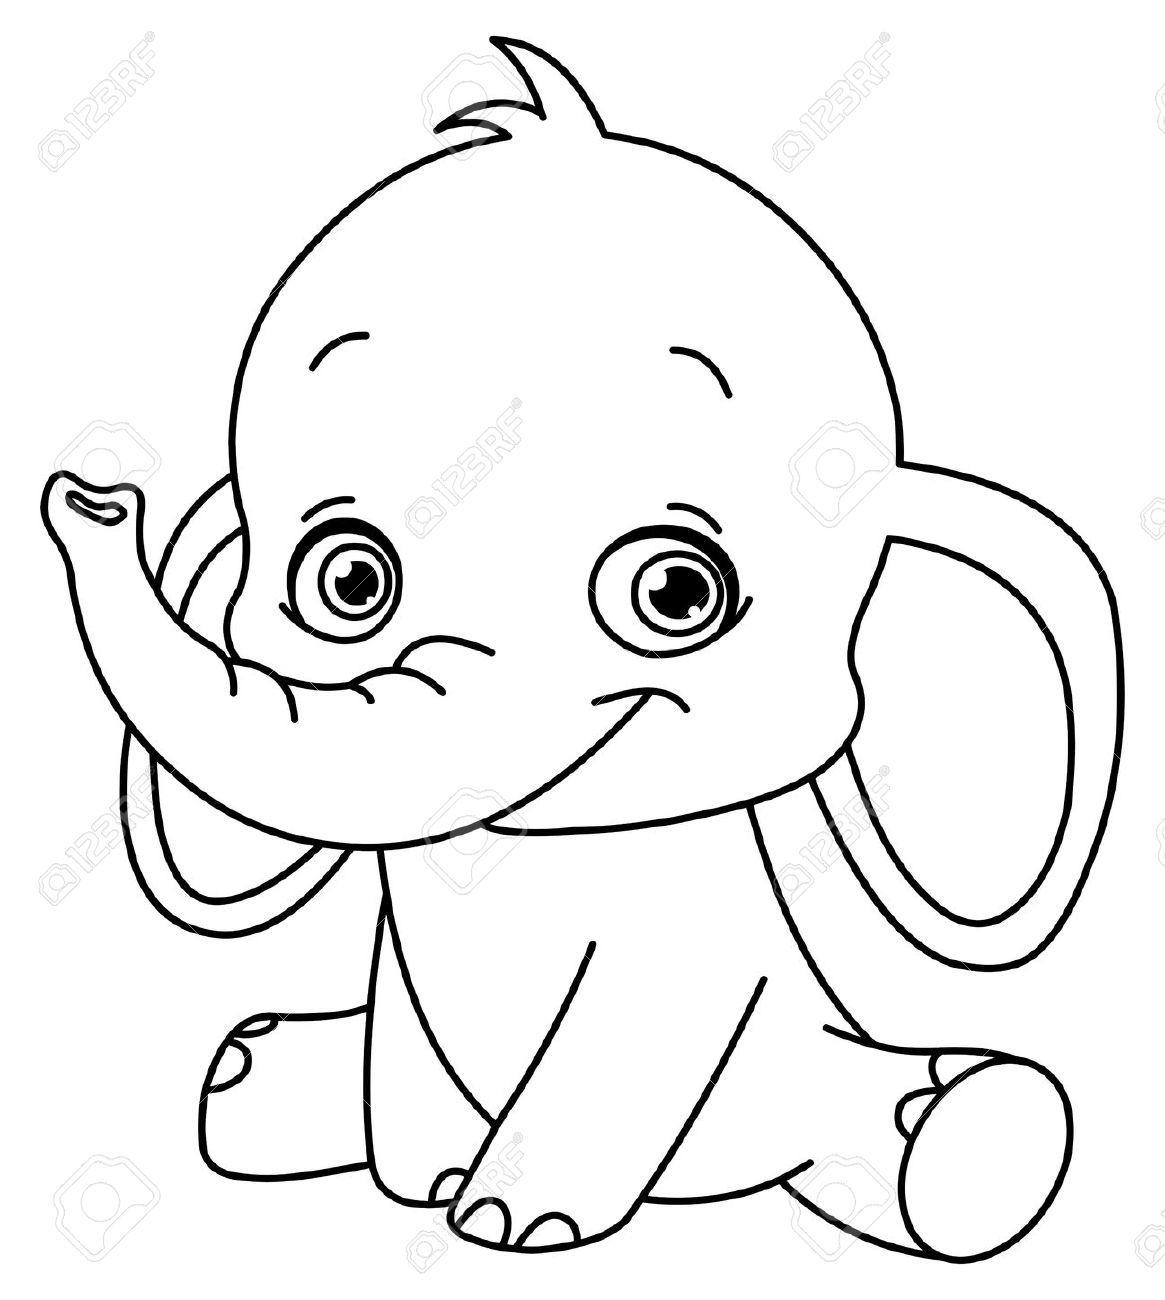 cartoon drawing of elephant - Google Search | Ideas pacthwork ...